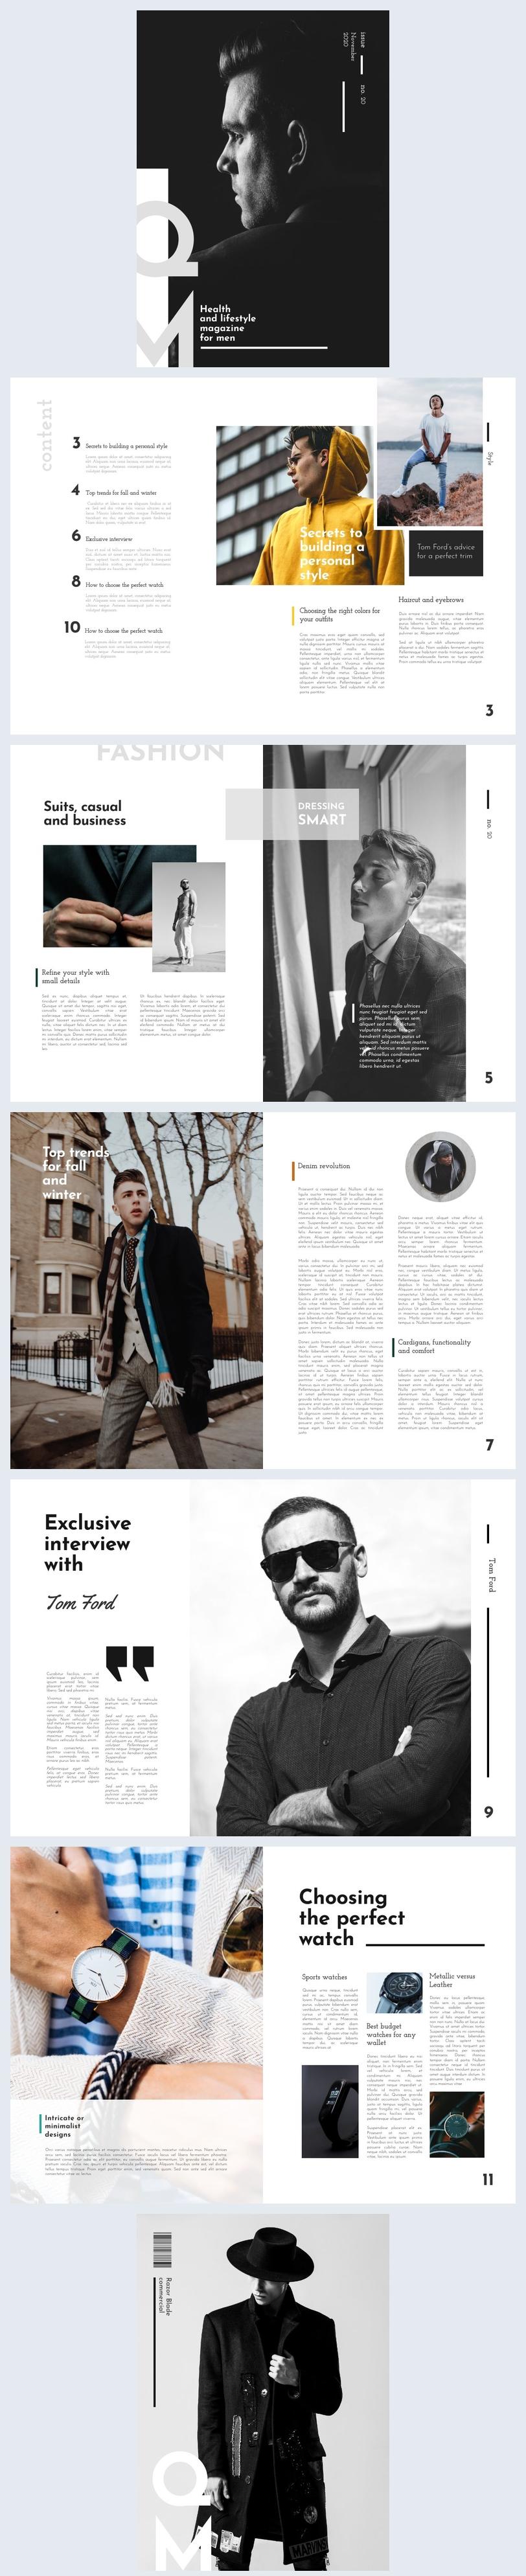 Lifestyle-Magazin Layout-Idee